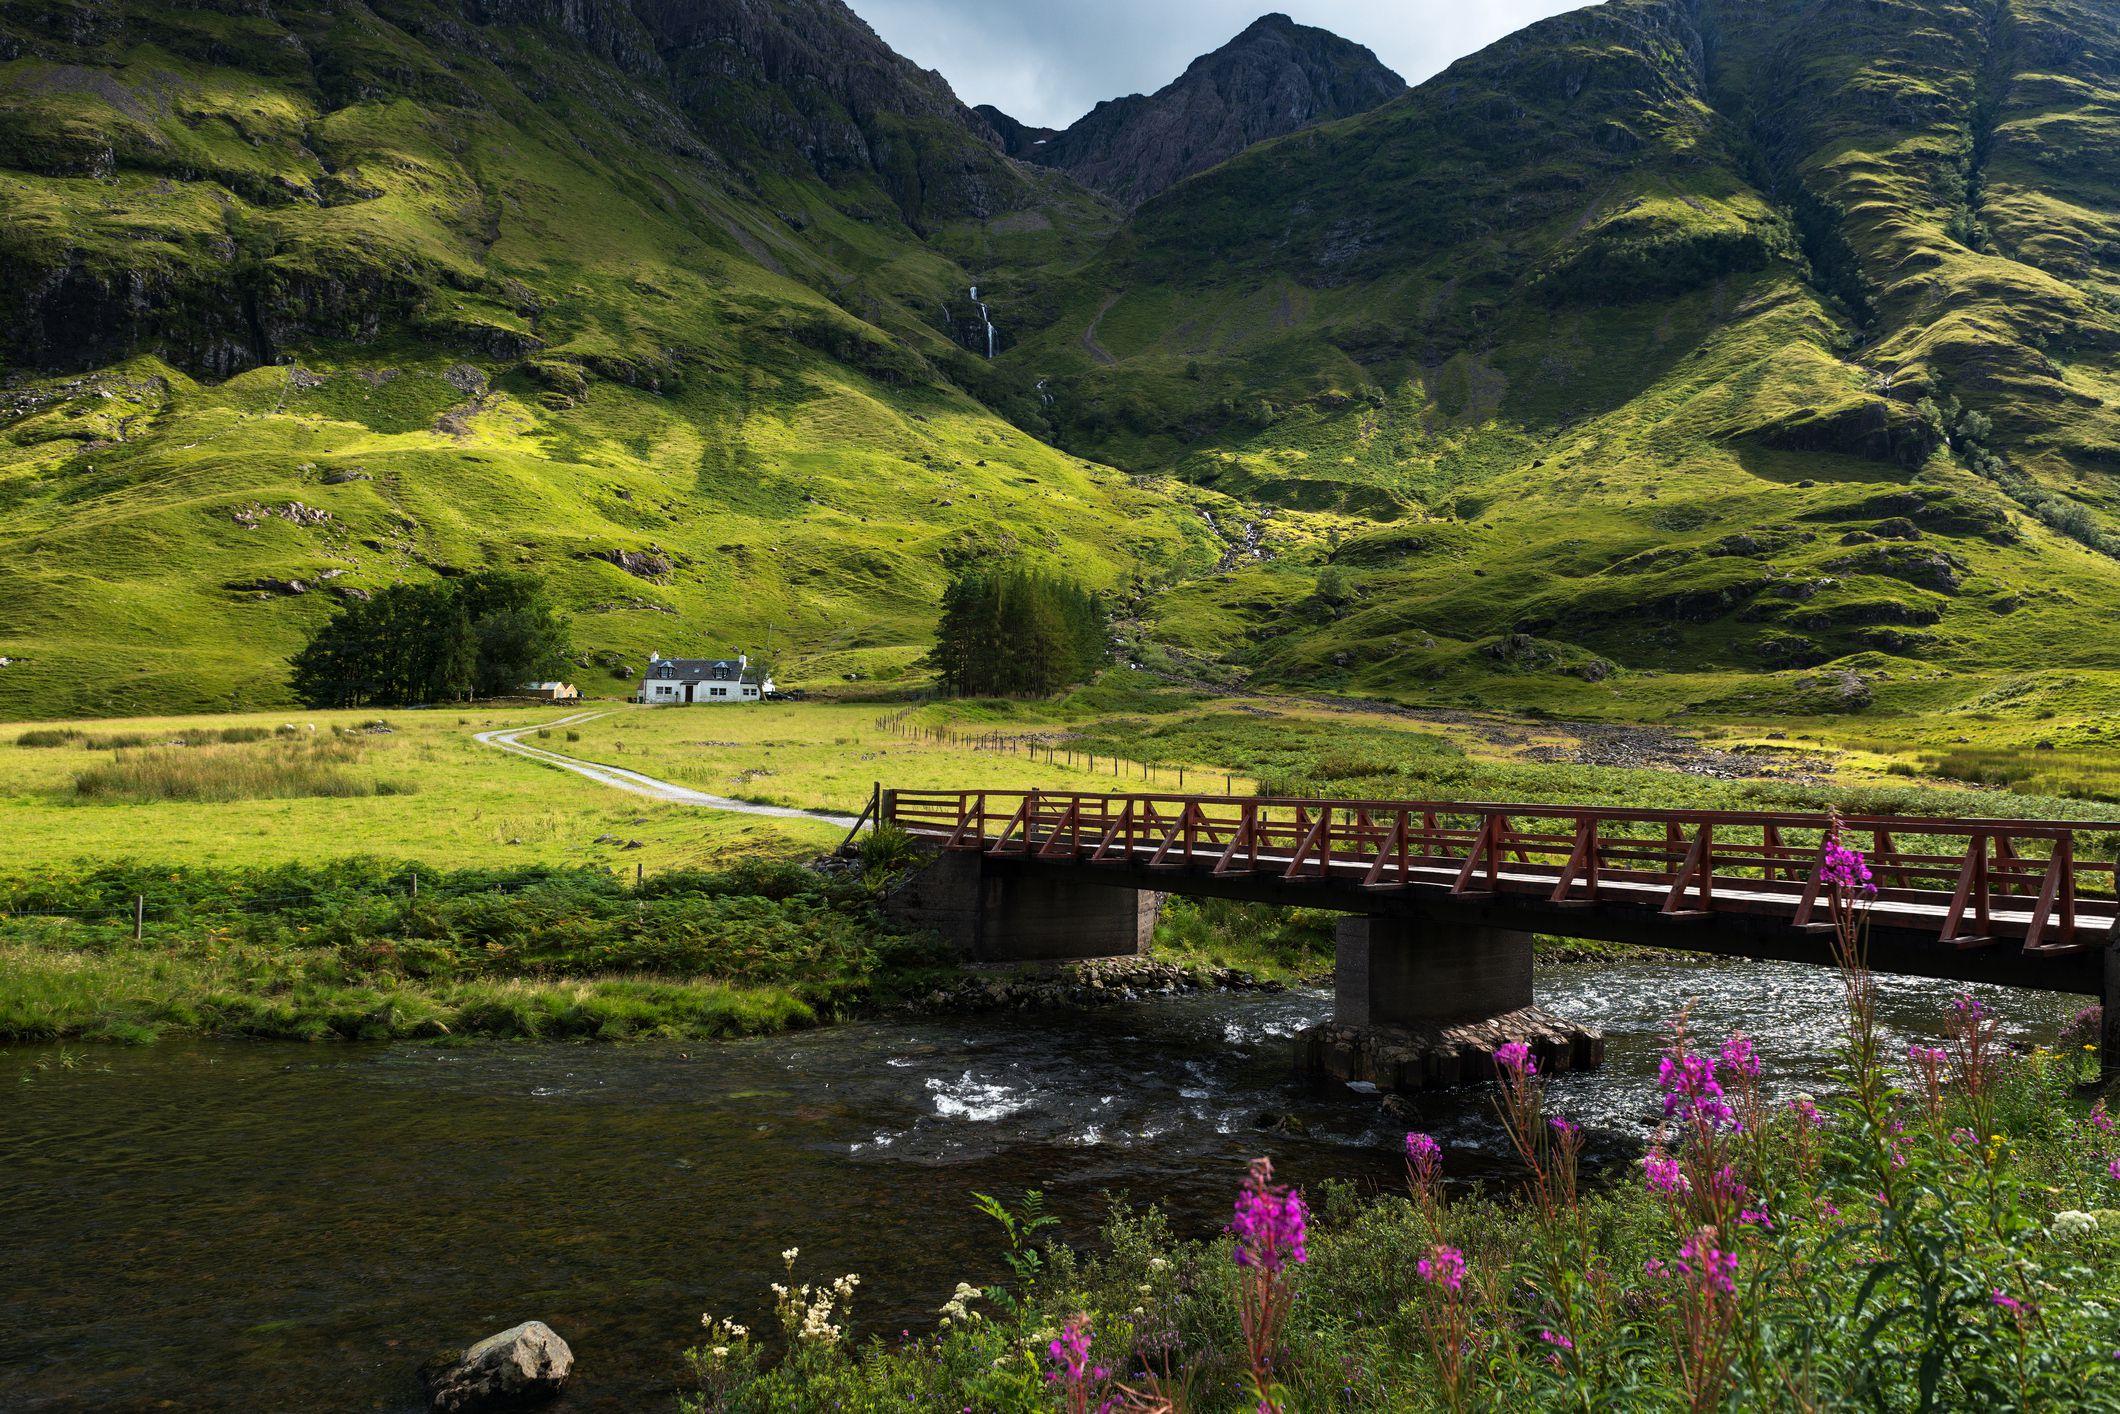 Bridge crossing the river Coe to cottage at Glencoe Highlands , Scotland